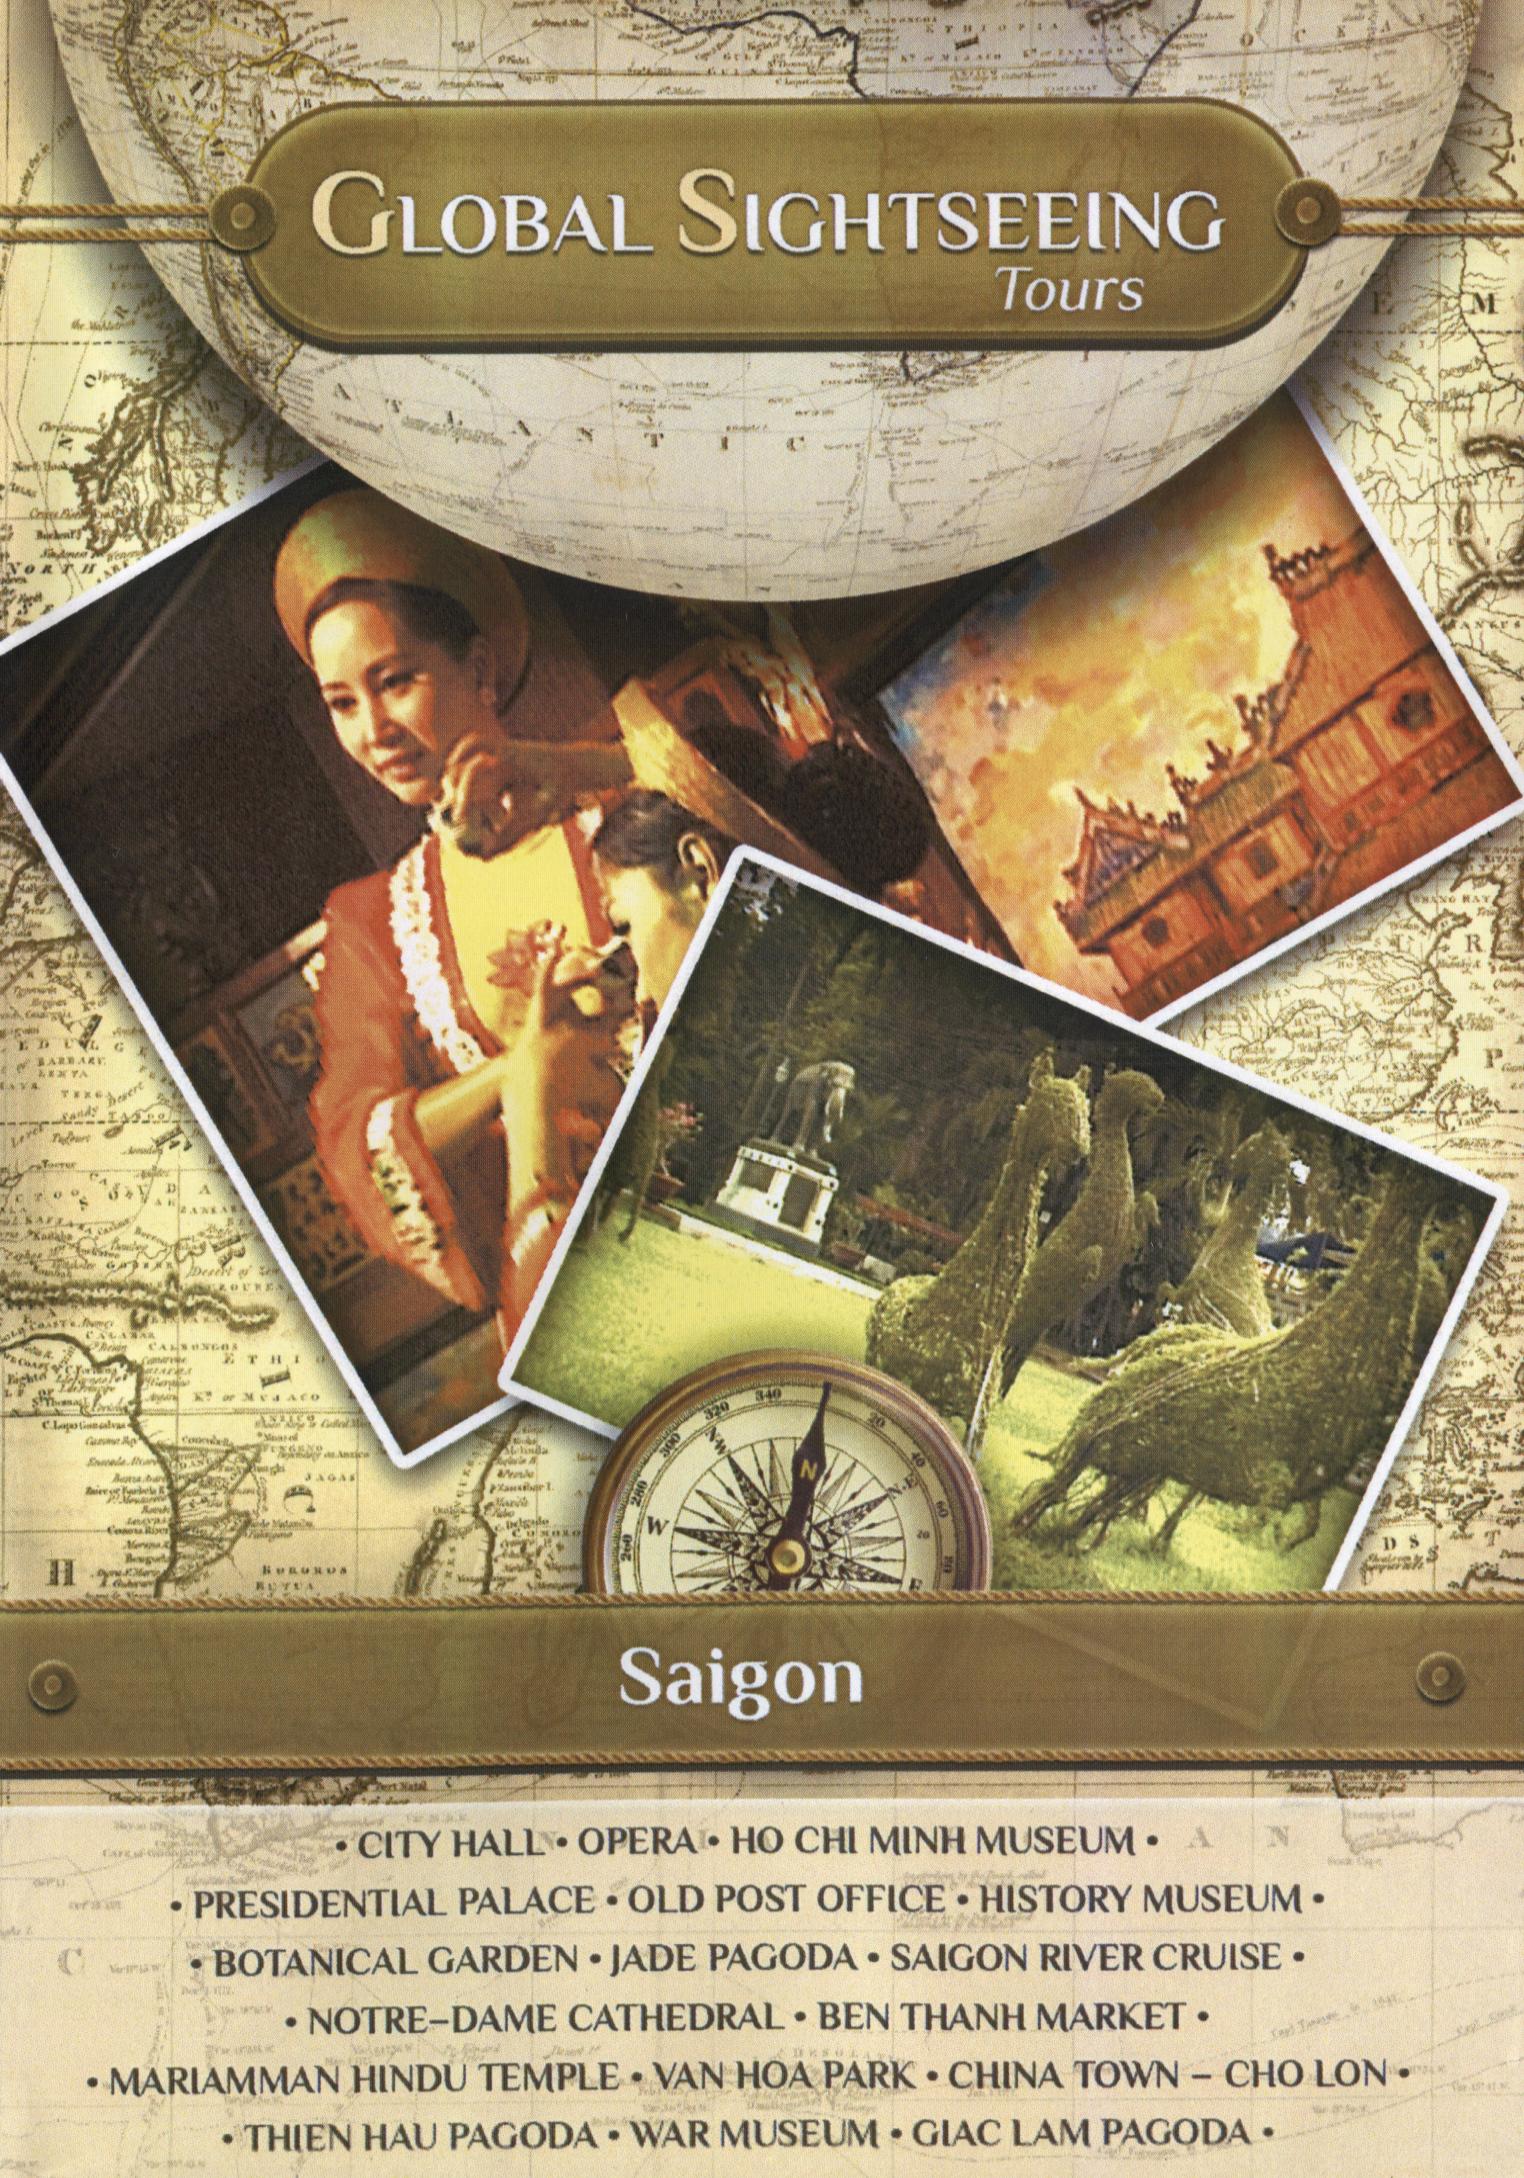 Global Sightseeing Tours: Saigon